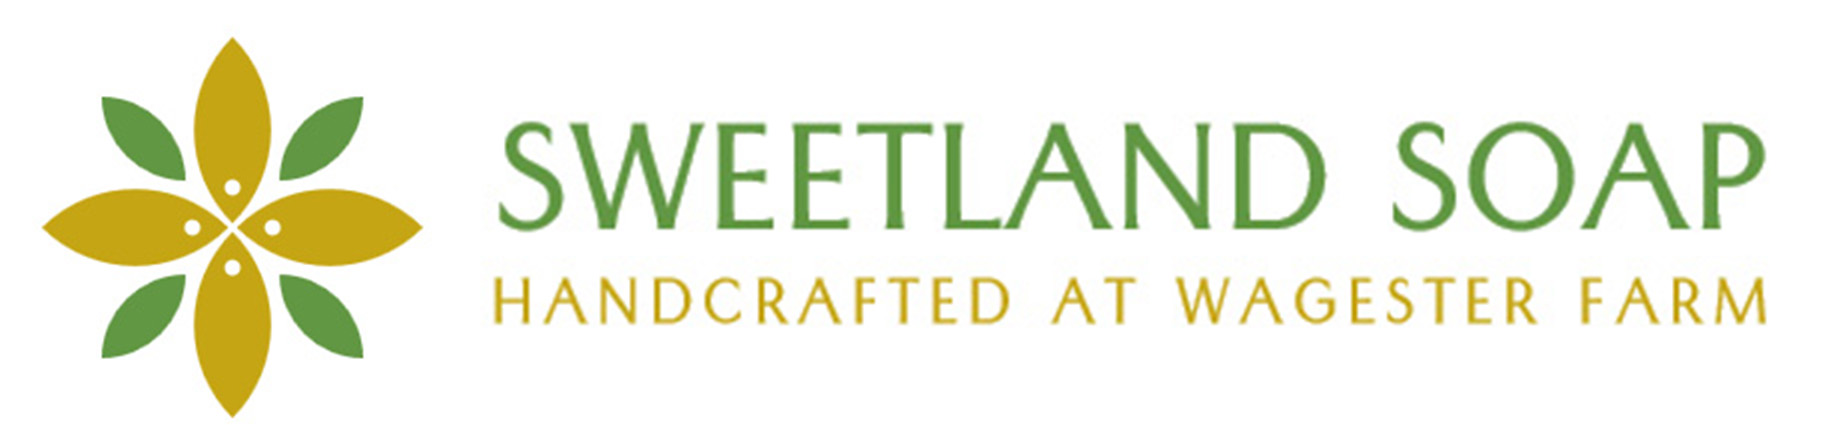 Sweetland Soap